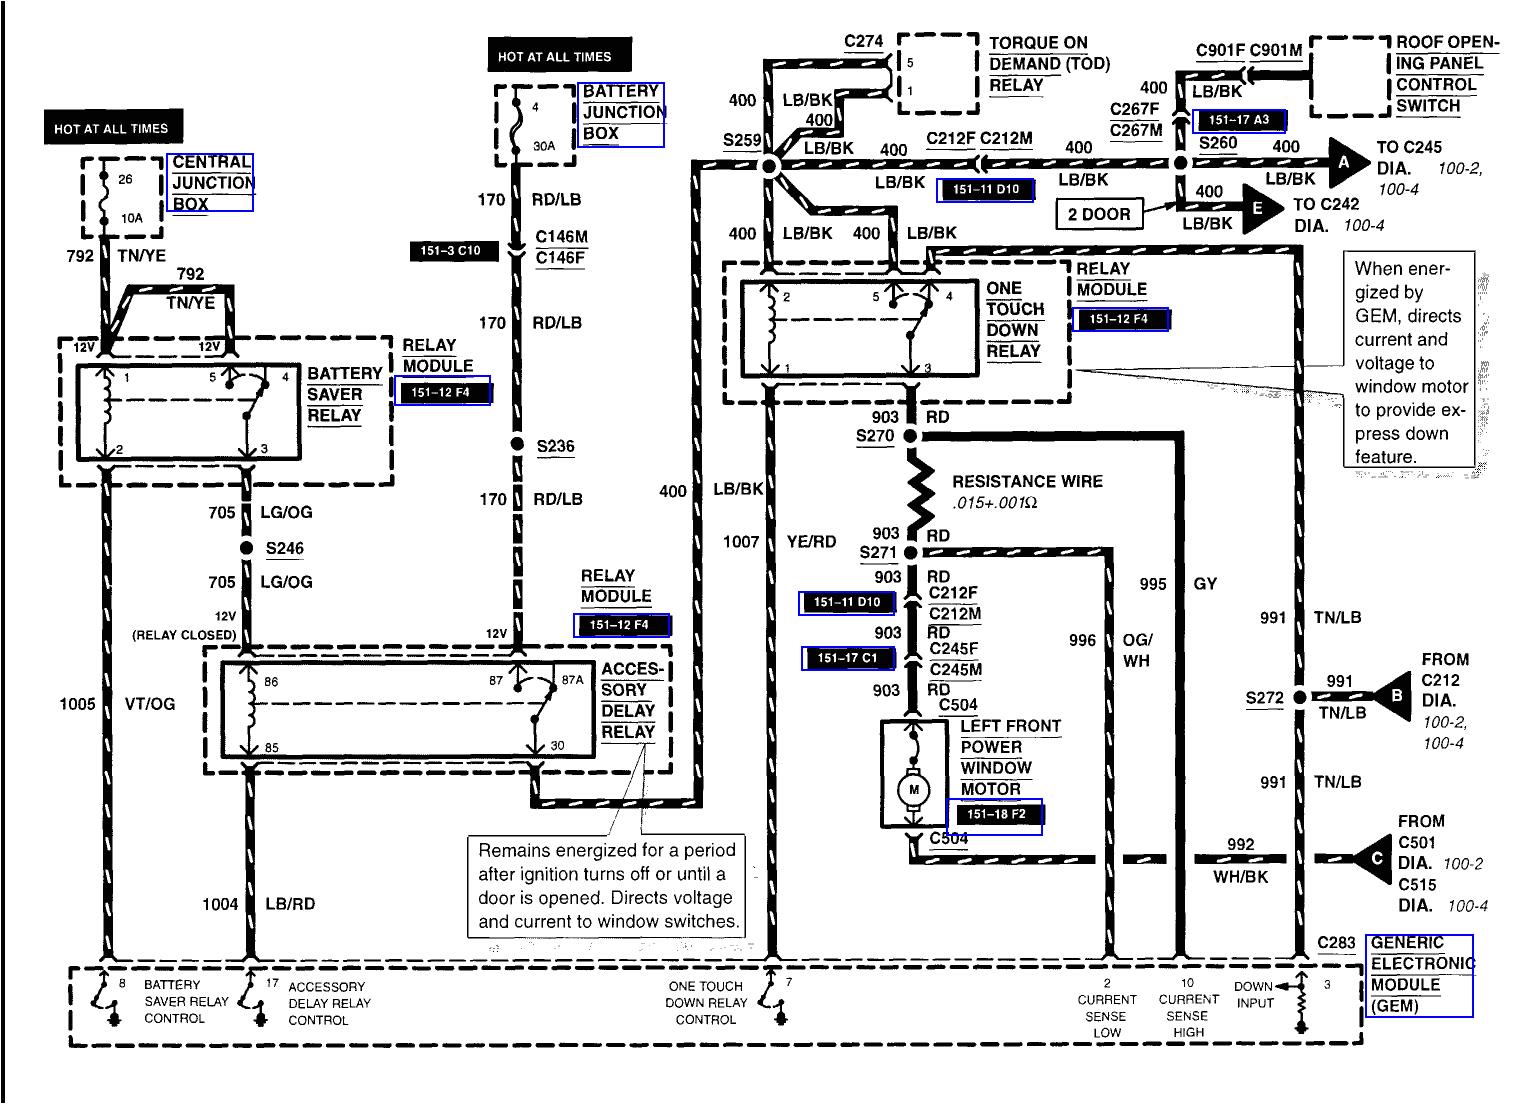 Ford Explorer Wiring Diagram Electrical Wiring Diagrams ford Explorer Window Wiring Diagram New